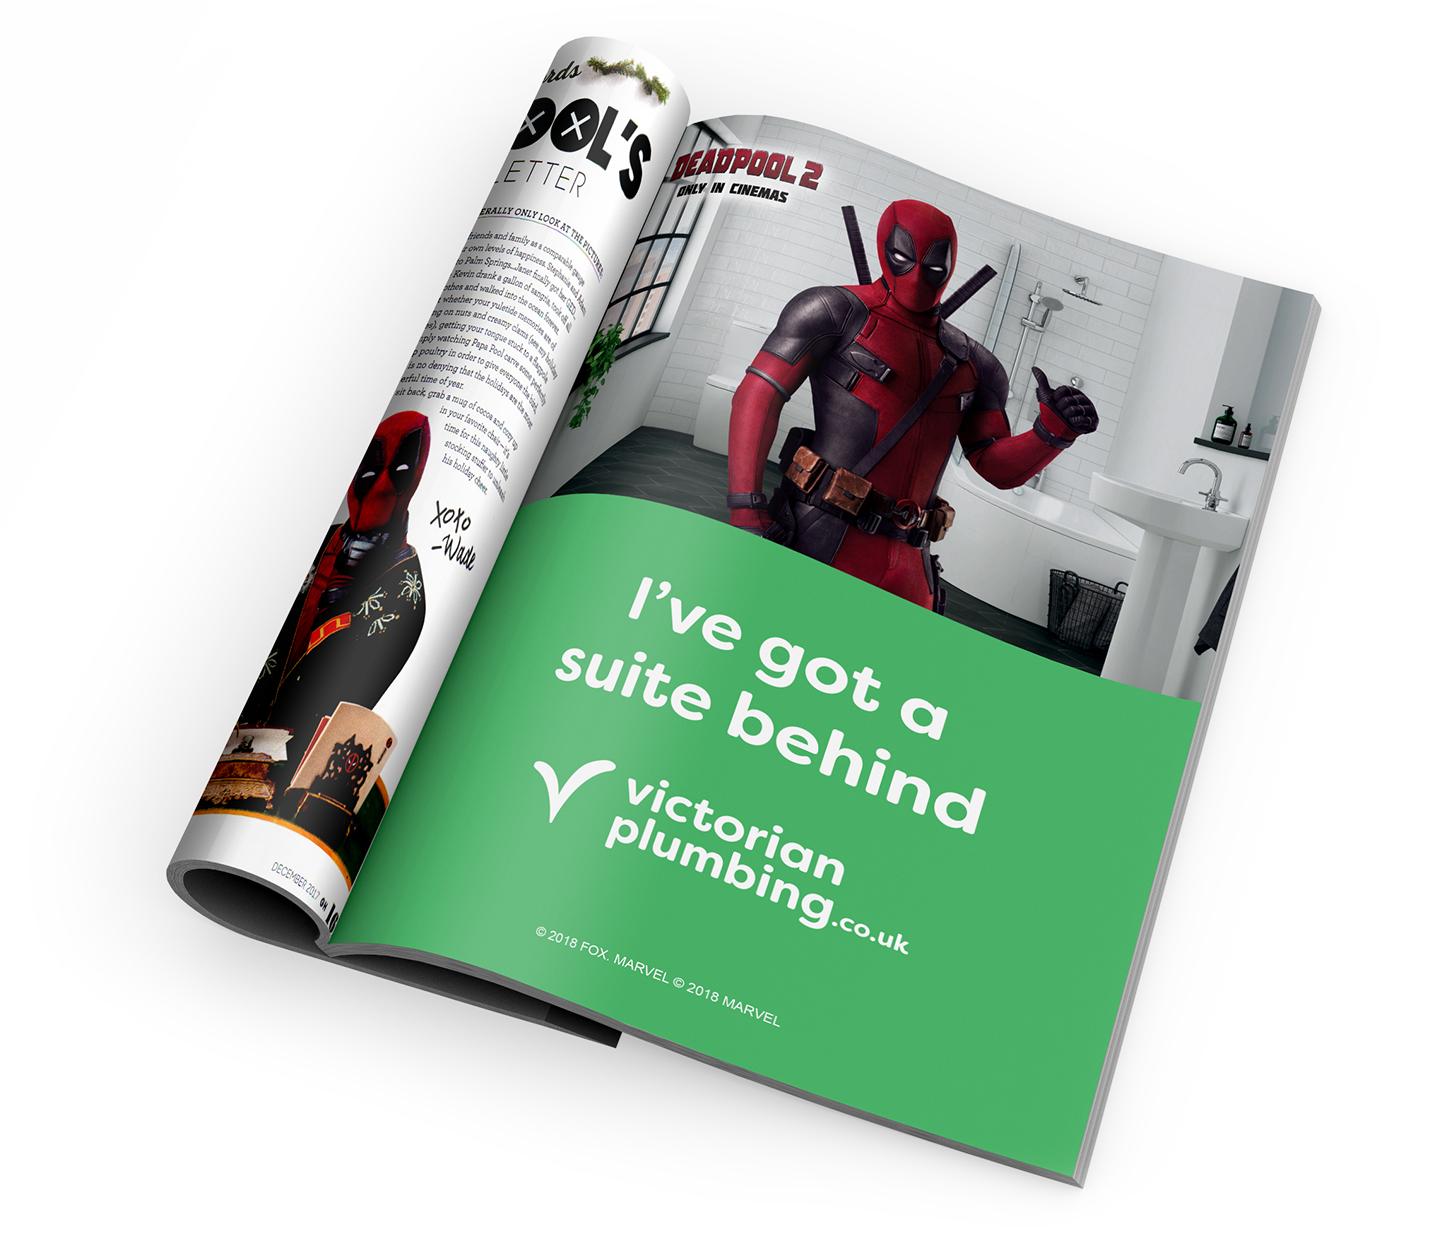 Deadpool 2 Film Partnership Victorian Plumbing Promotion